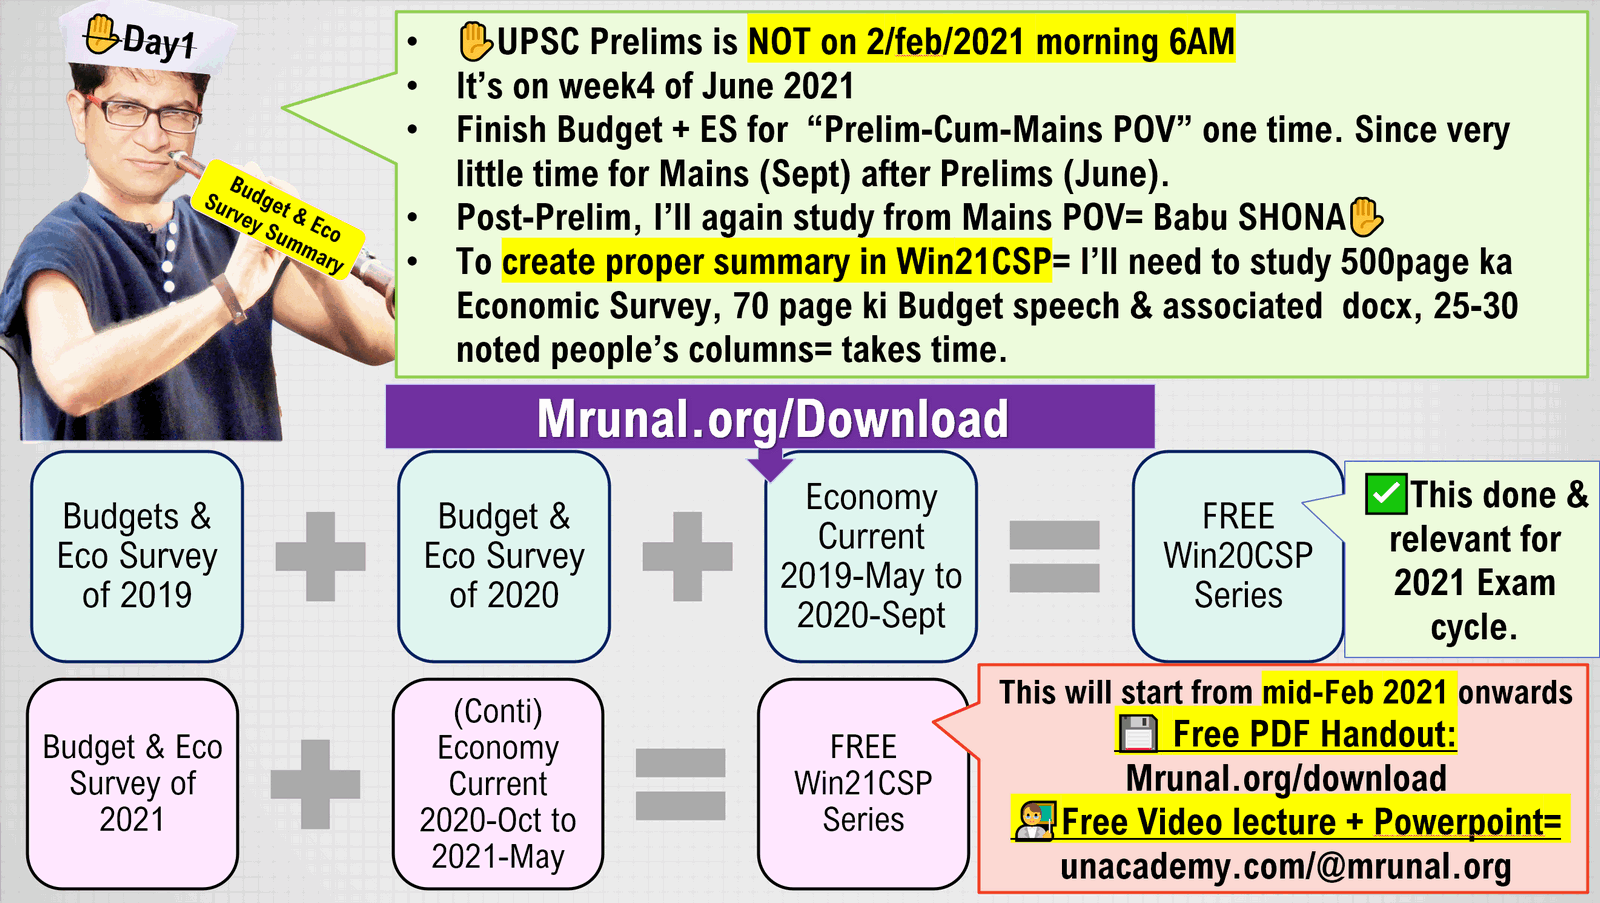 Free Download of Mrunal's Economy 2021Updates Handout (Win21CSP Series)